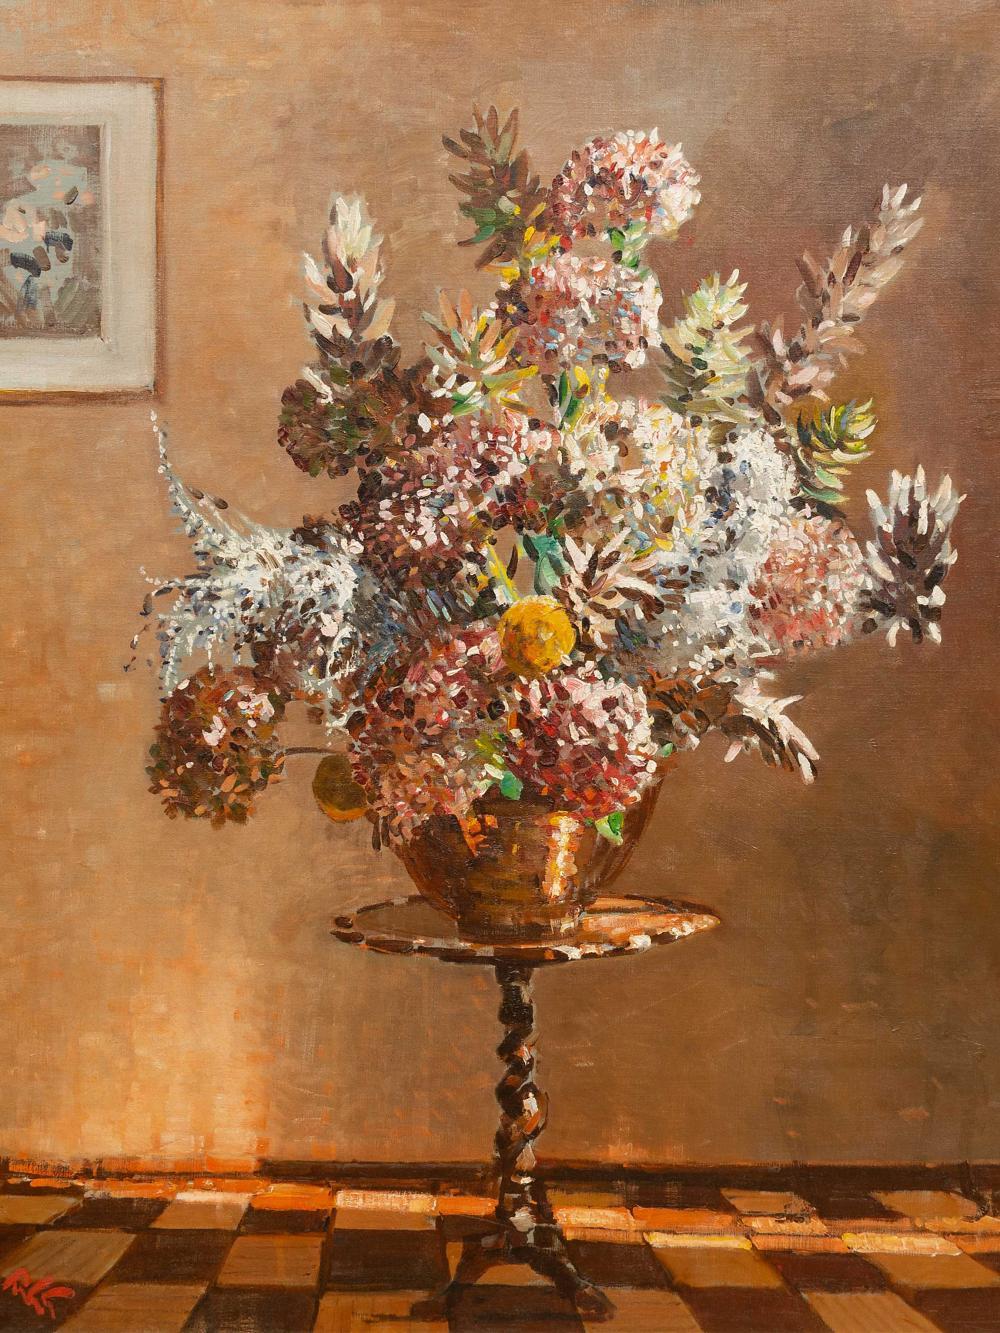 Robert Gwelo Goodman (SA 1871 - 1939) Oil, Still Life Flowers on a Table, Signed, 92 x 75